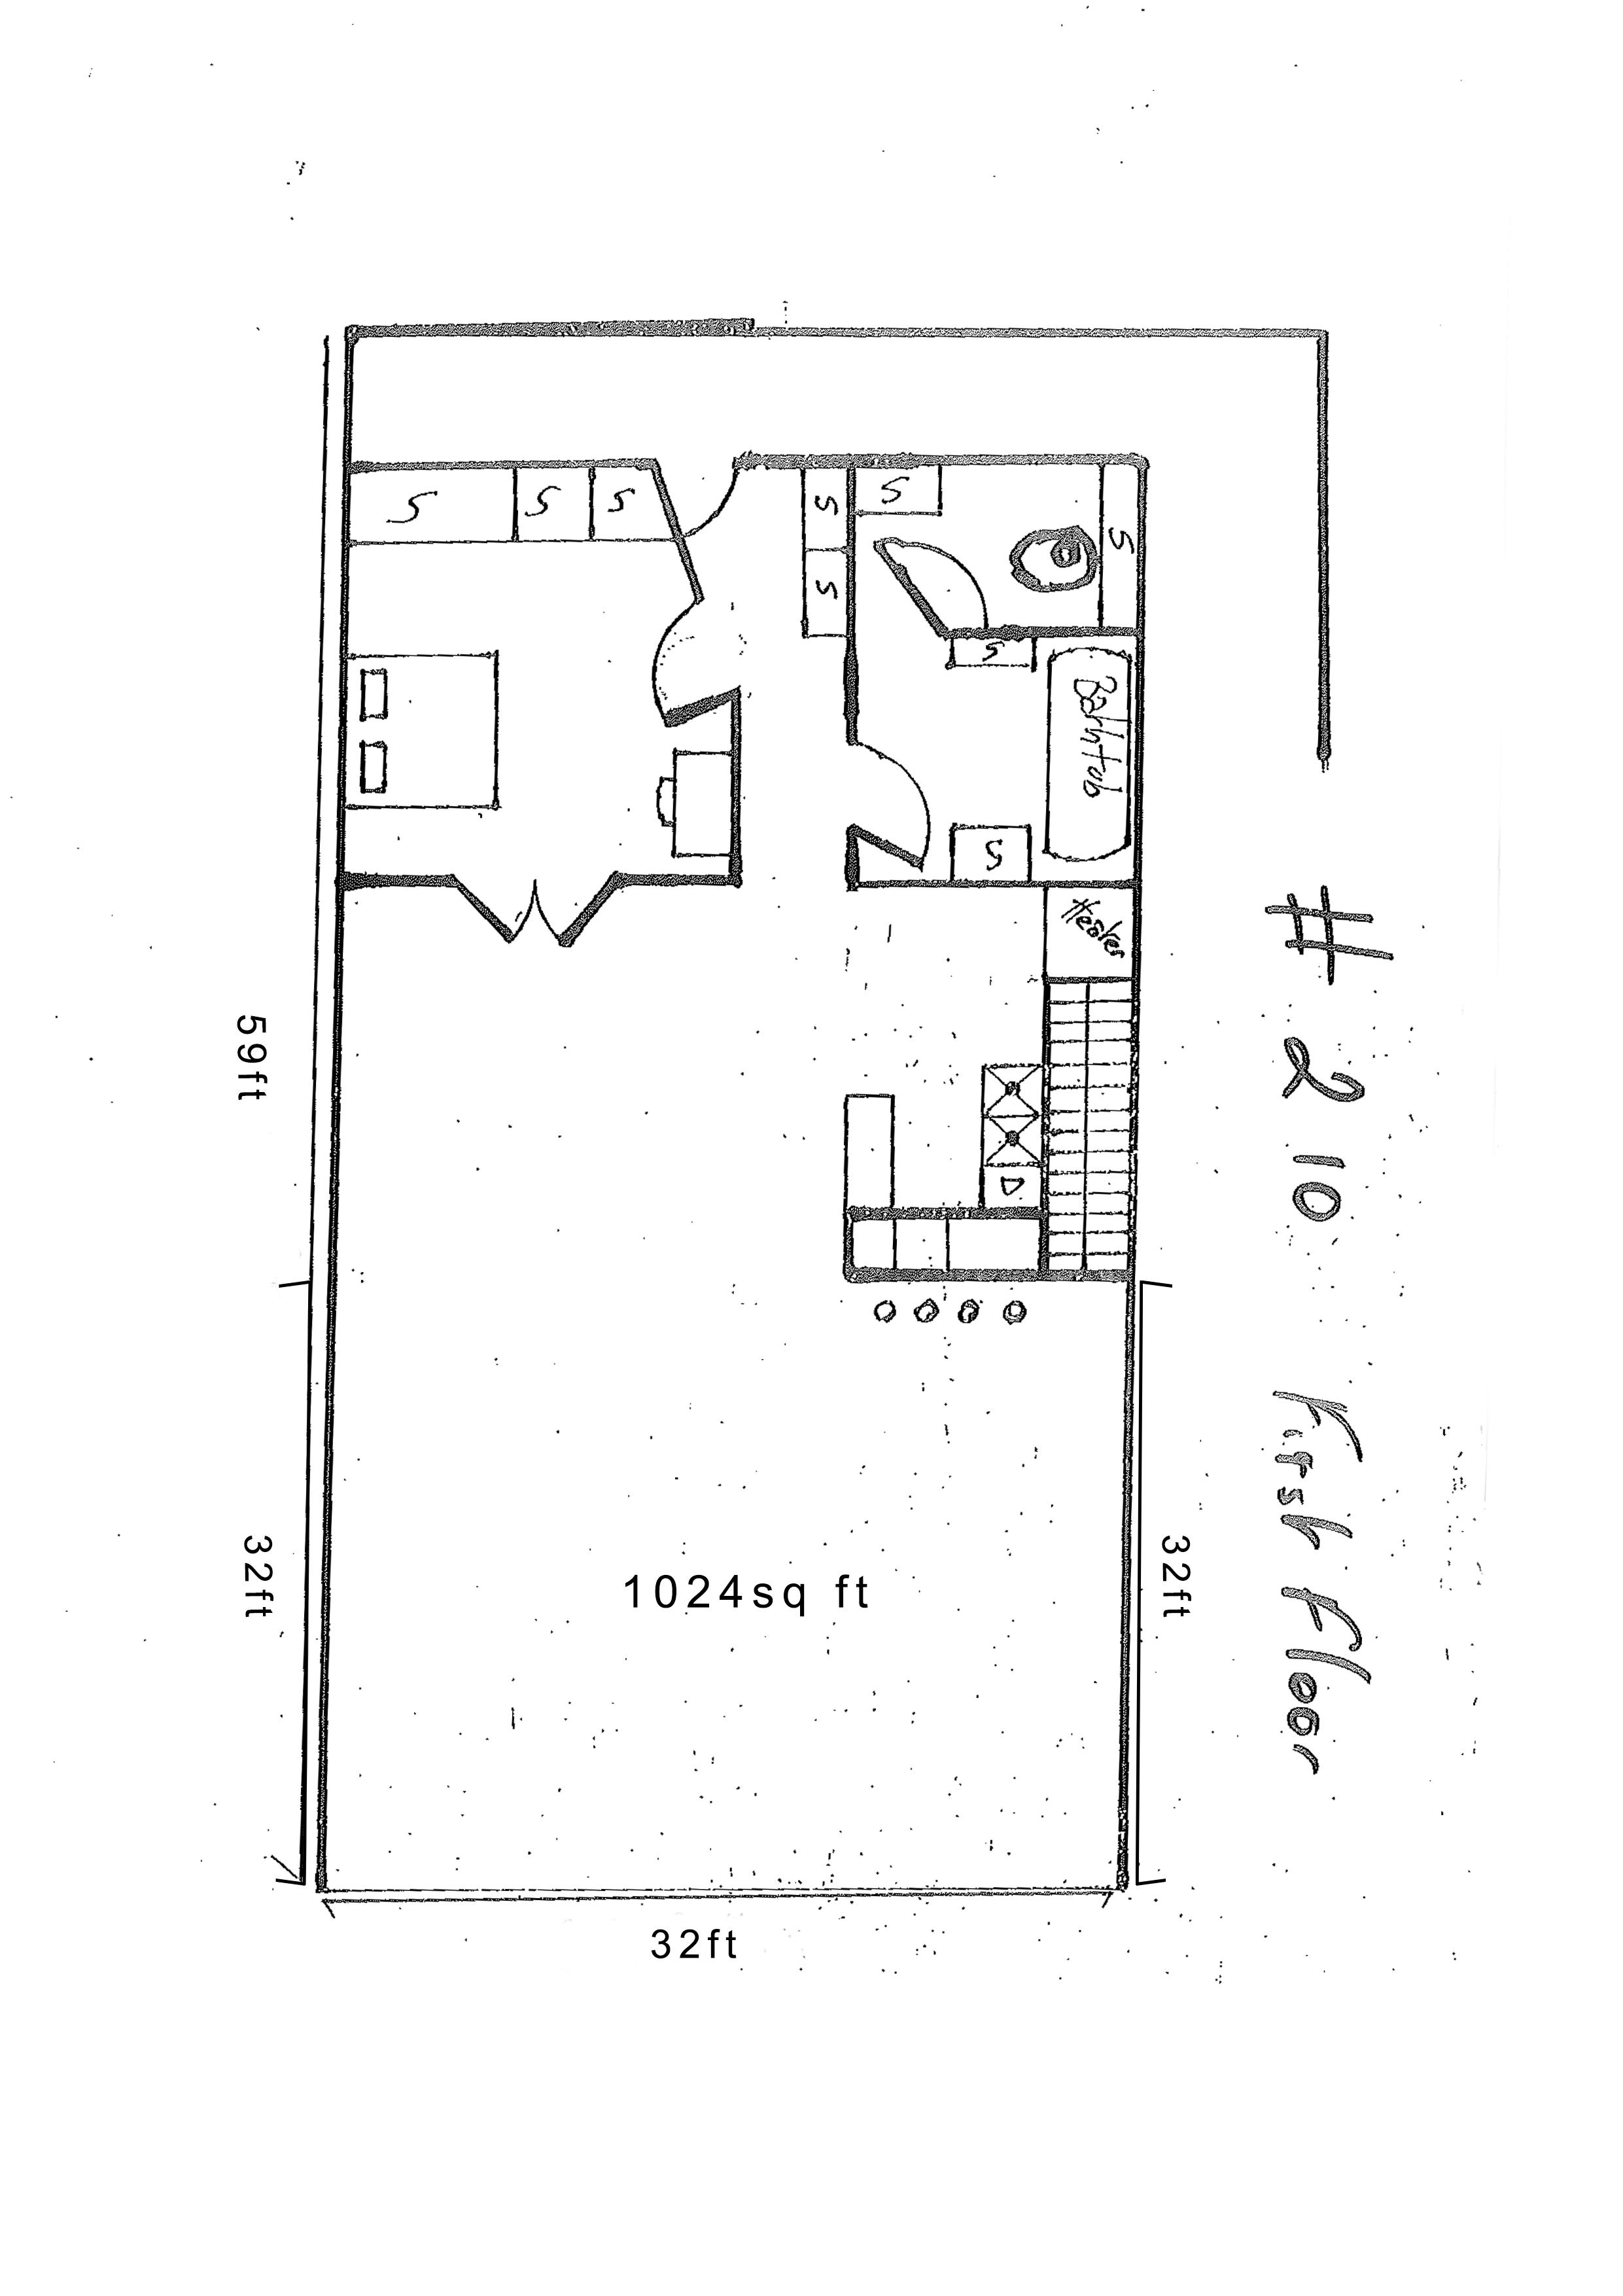 floorplan_updated (1).jpg